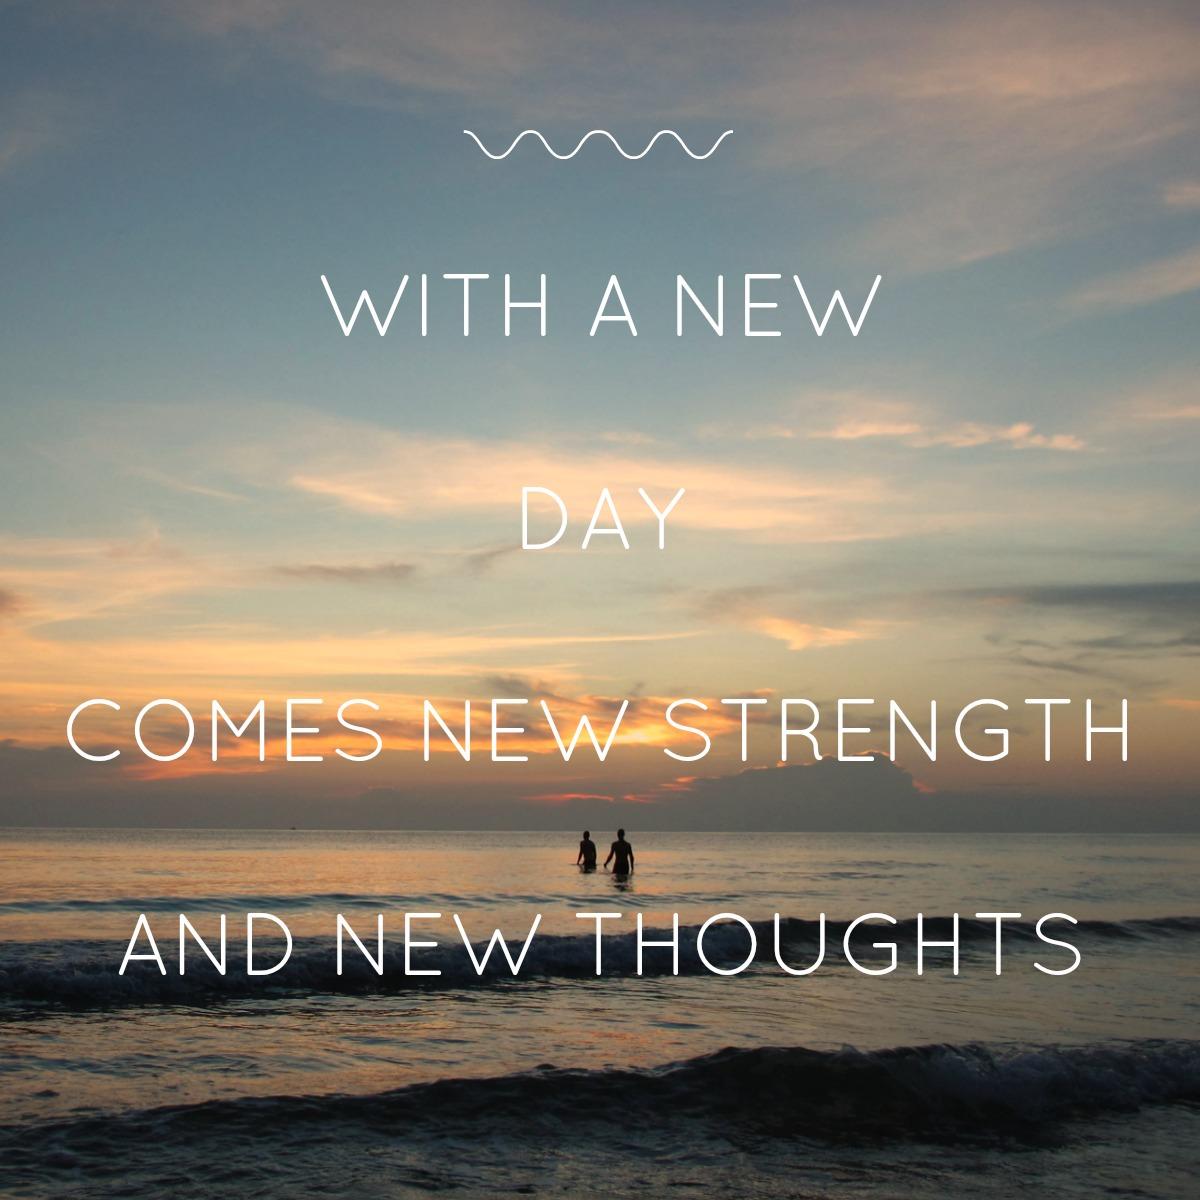 motivation quote, inspiration